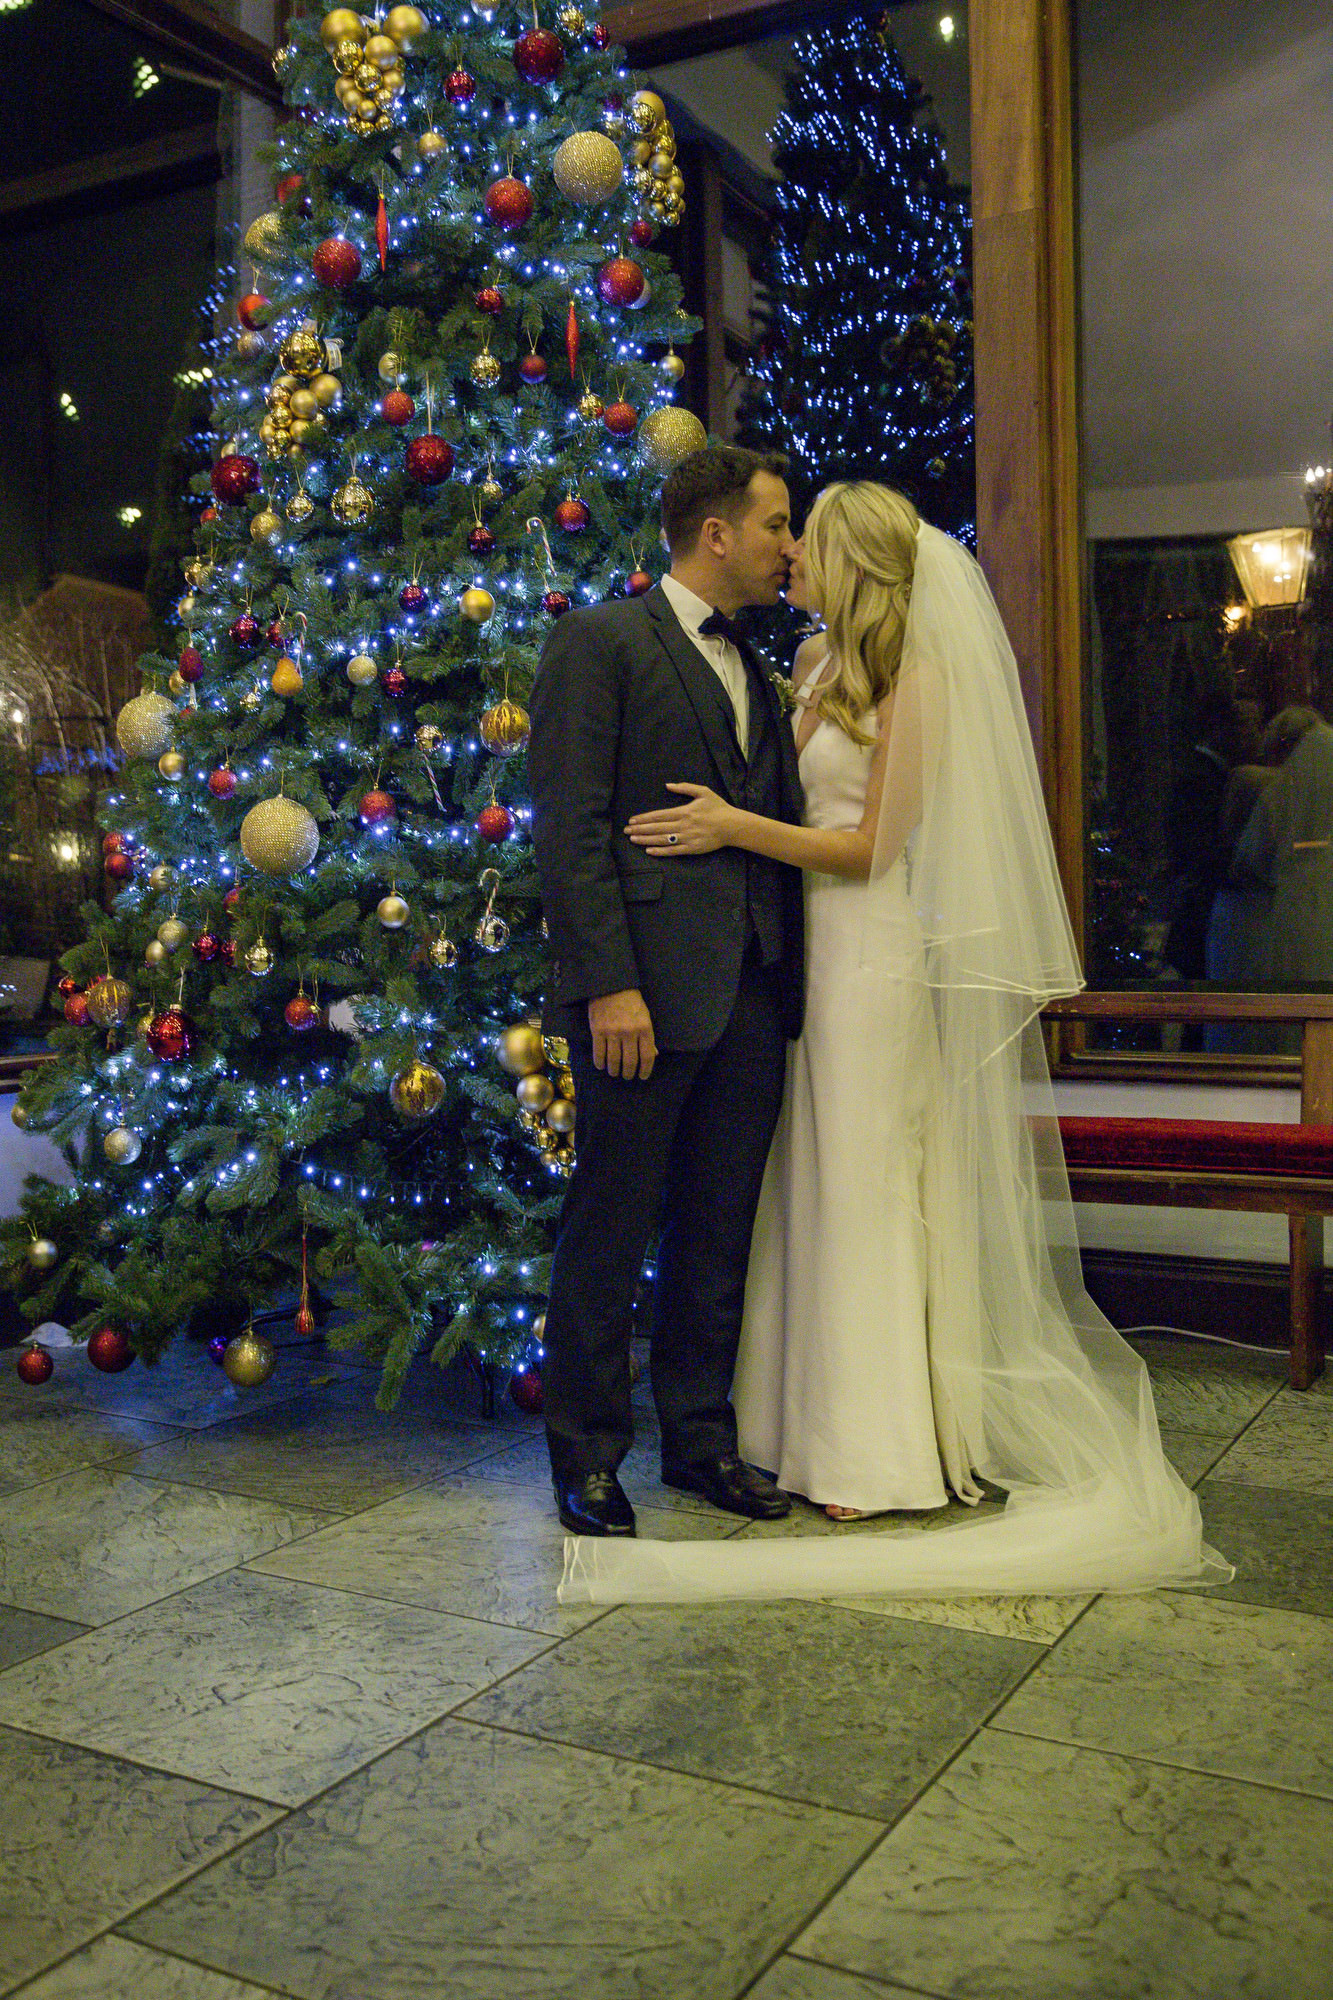 muckross_park_hotel_grougane_barra_wedding_photographer_goldenmoments_068.jpg